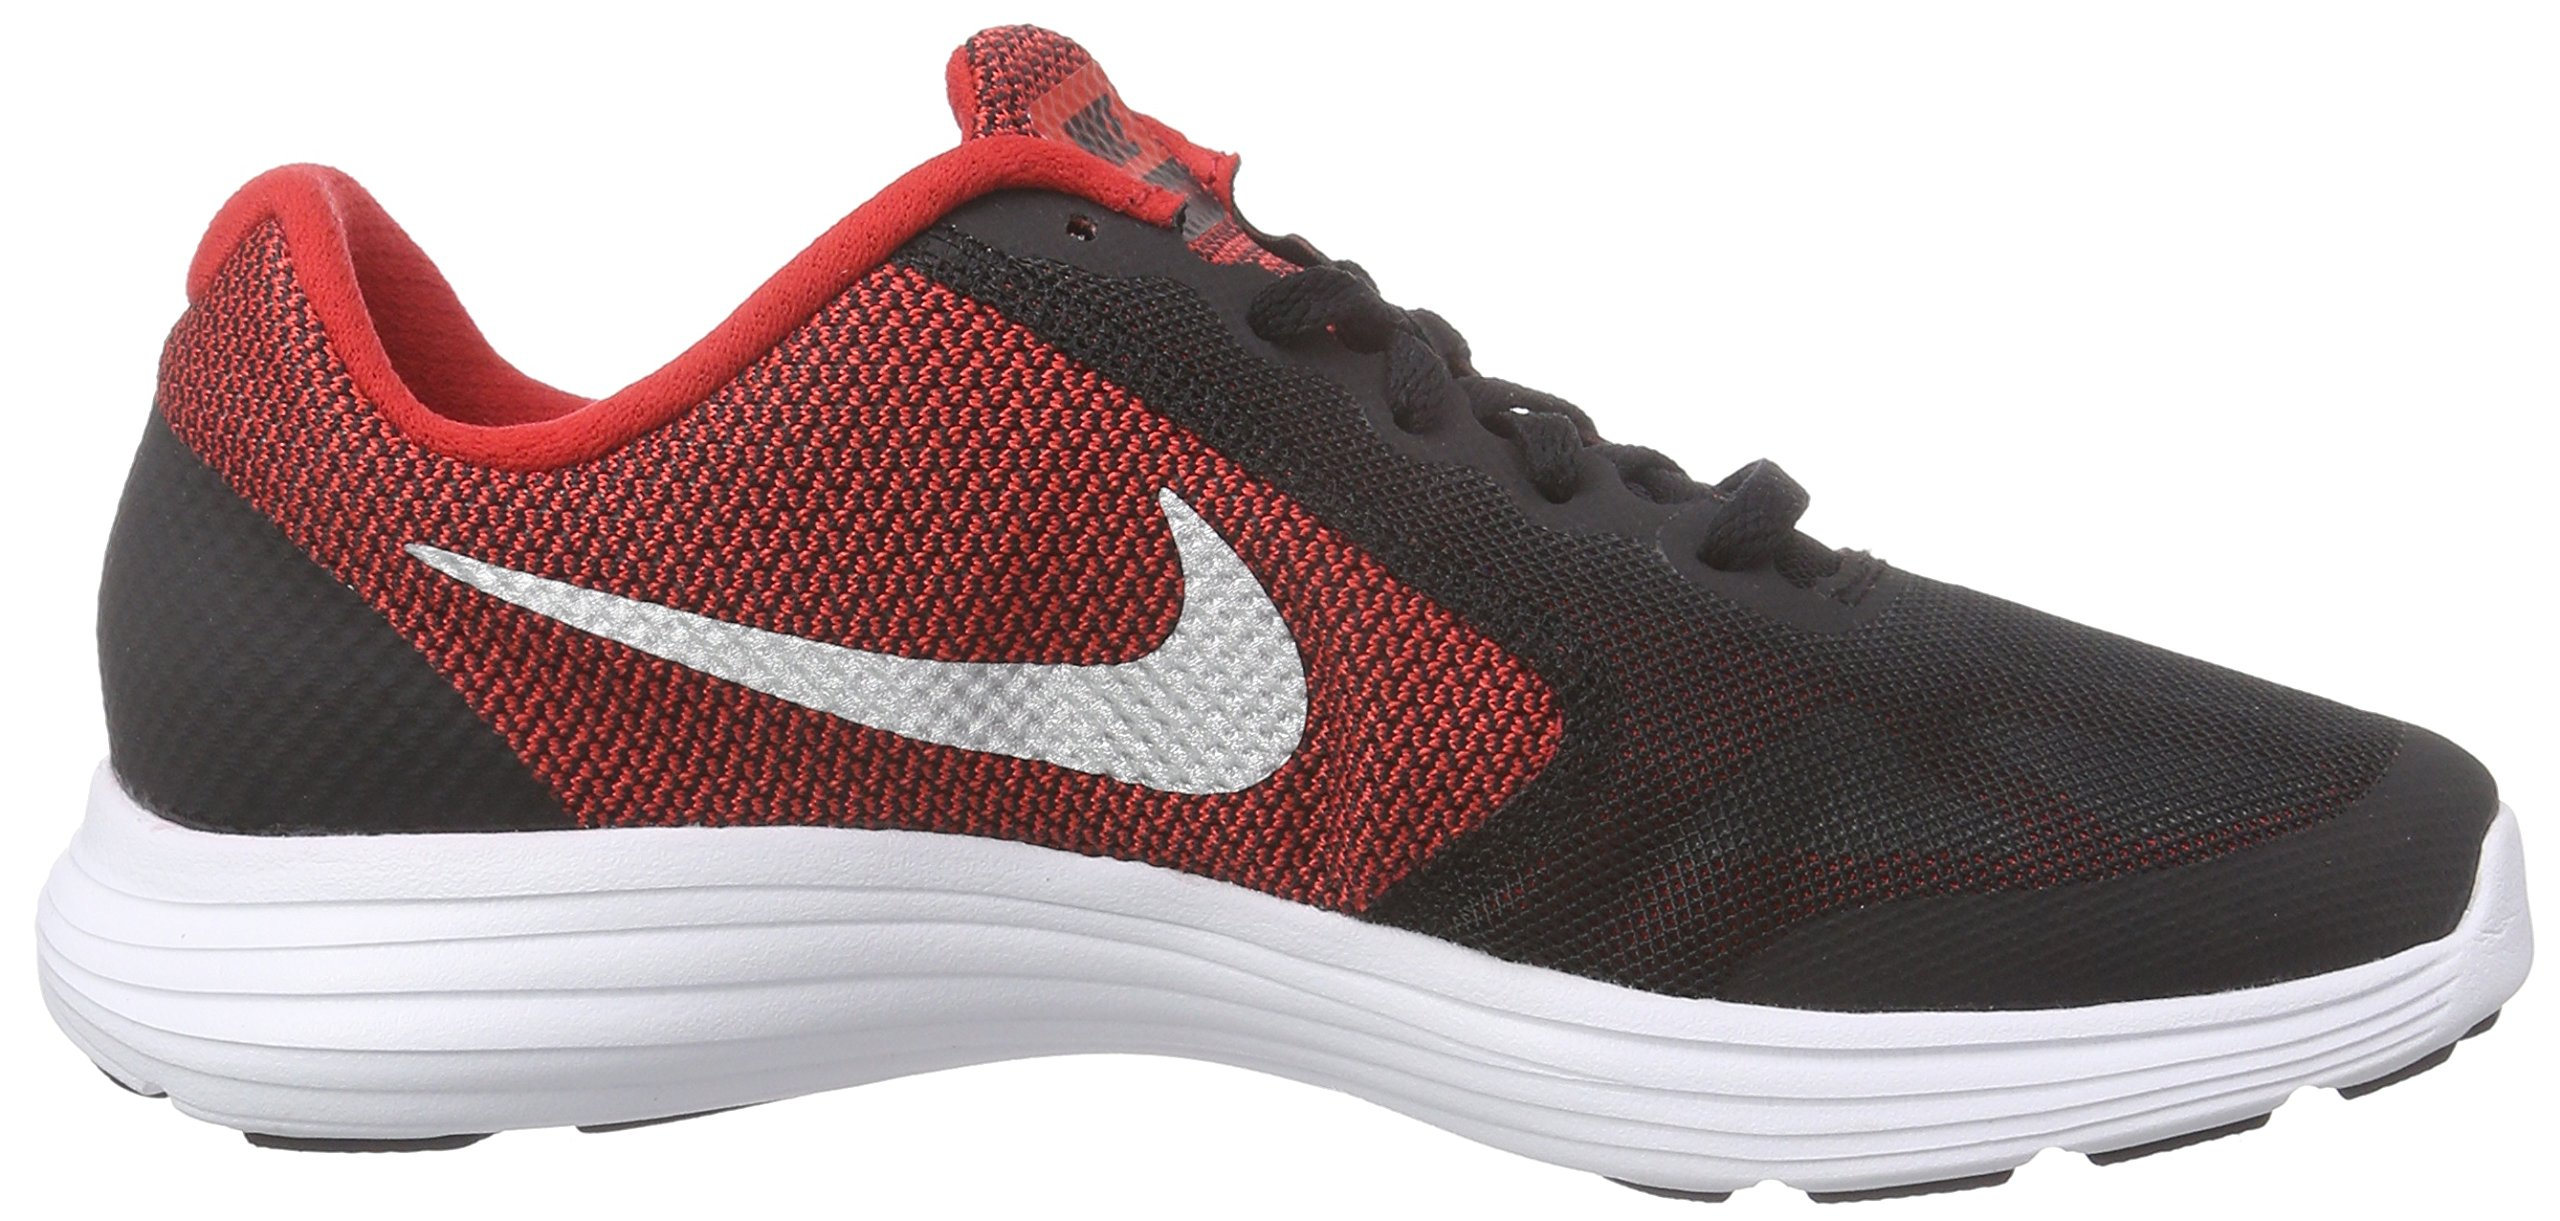 NIKE Boys' Revolution 3 Running Shoe (GS), University Red/Metallic Silver/Black, 4 M US Big Kid by Nike (Image #6)